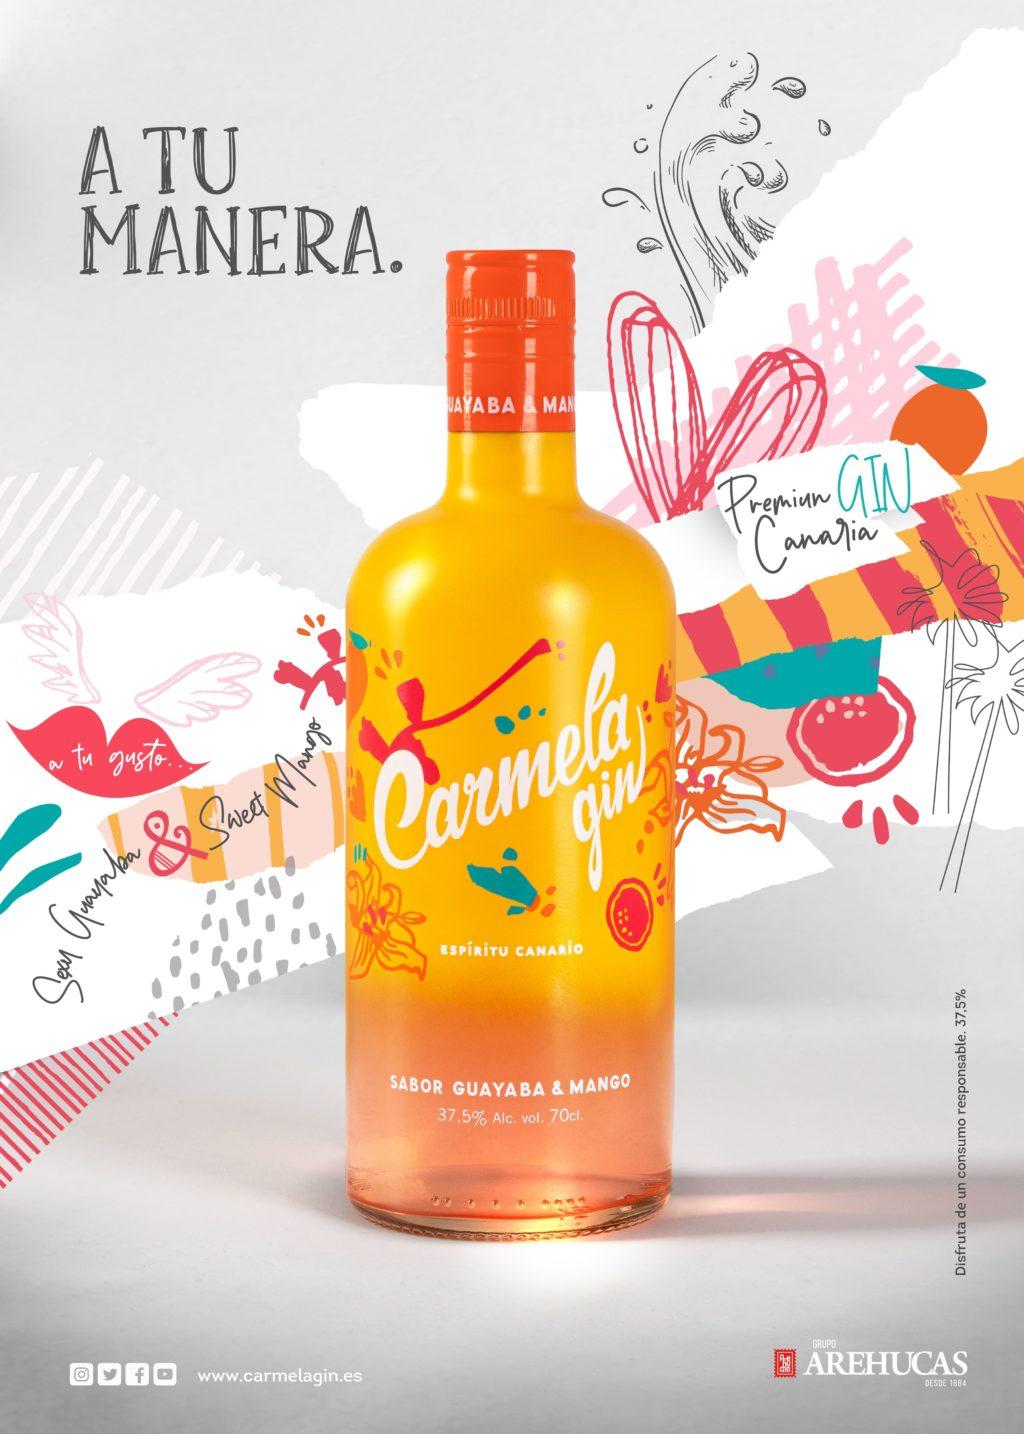 Foto de Nueva botella Carmela gin